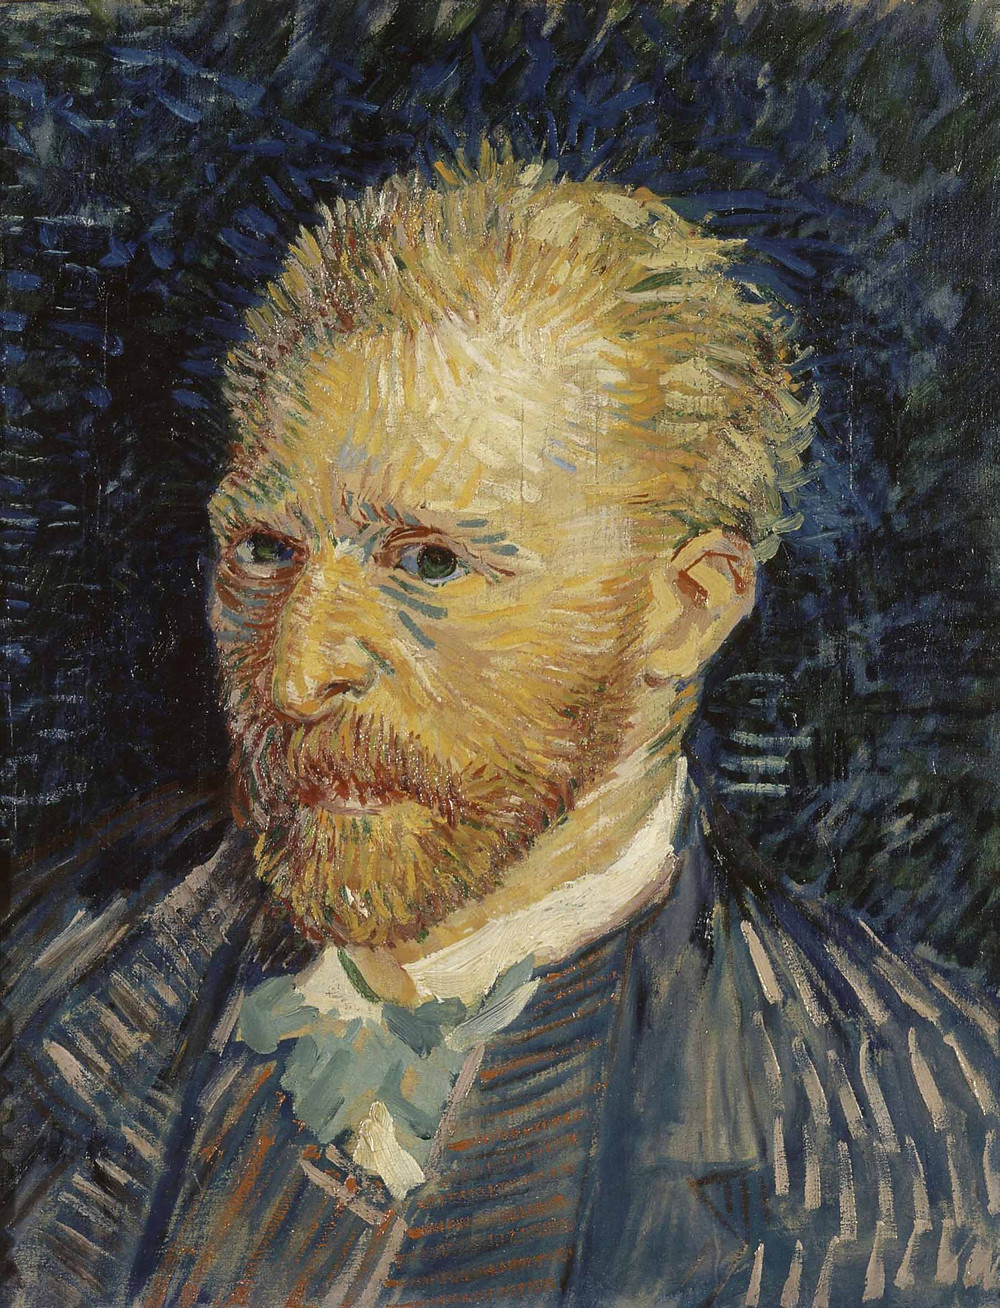 Self portrait by Vincent Van Gogh in 1887